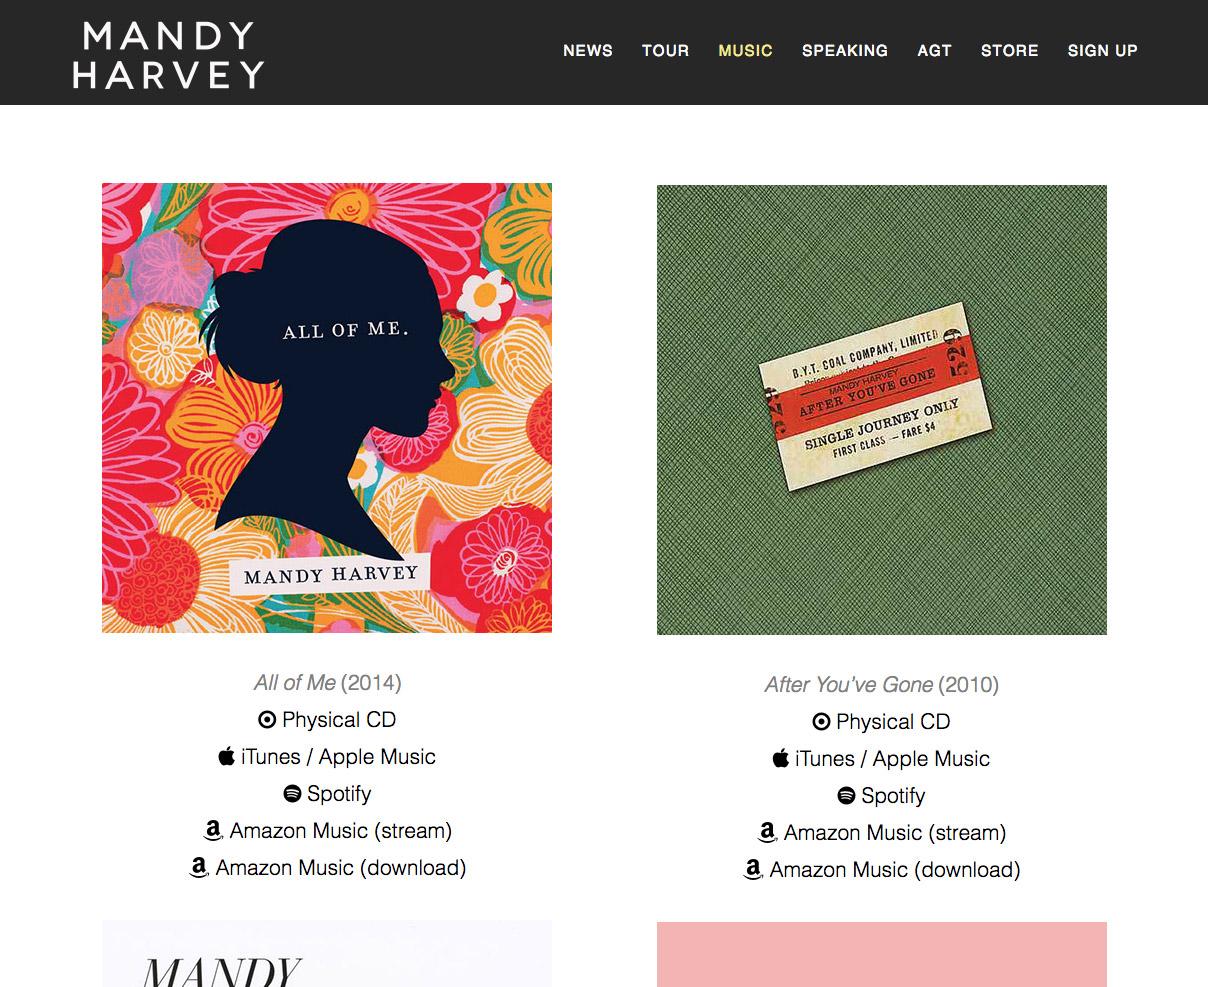 mandy harvey website screenshot of discography